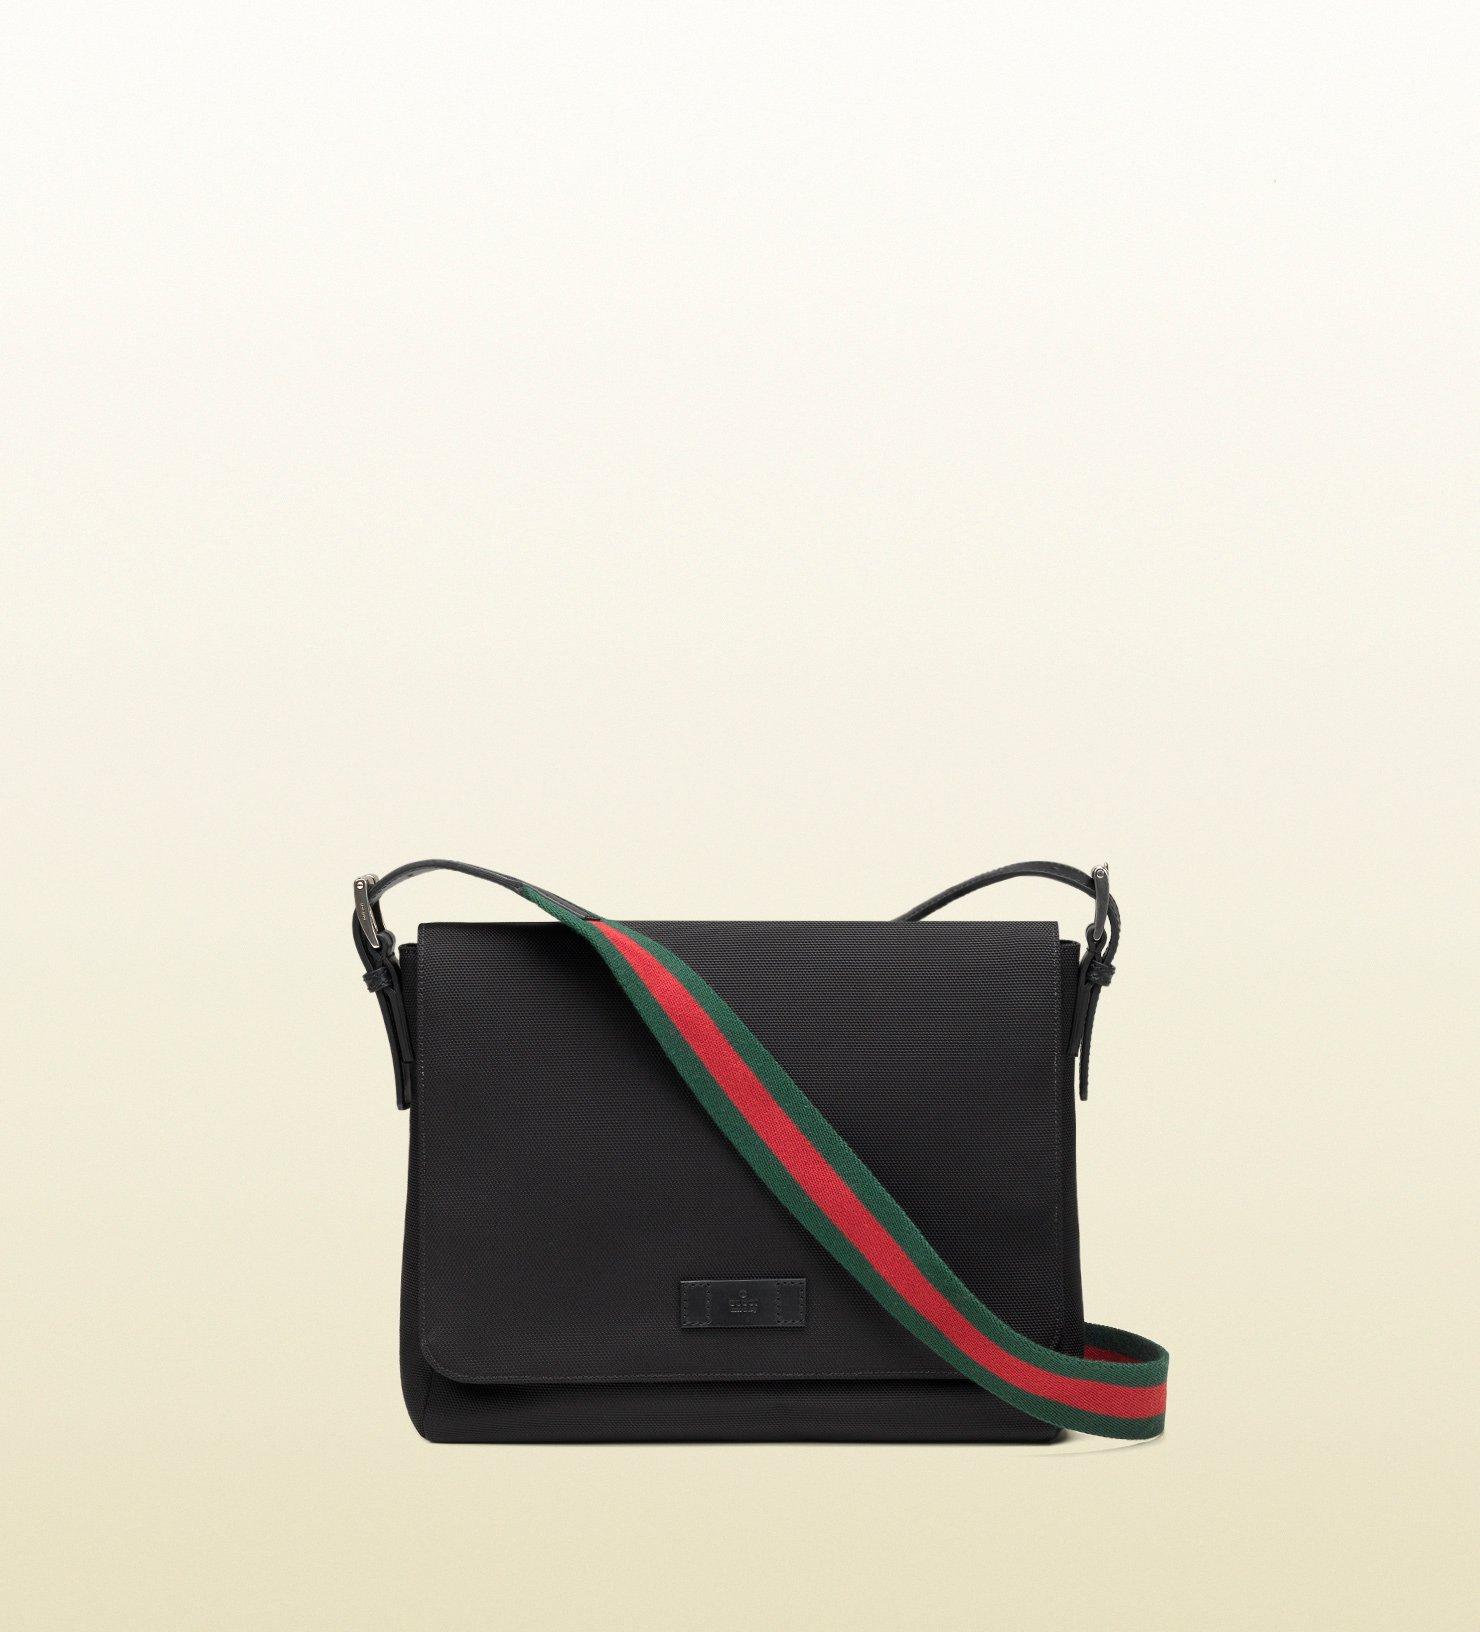 5fc5aee1eeac Gucci Black Techno Canvas Messenger Bag in Black for Men